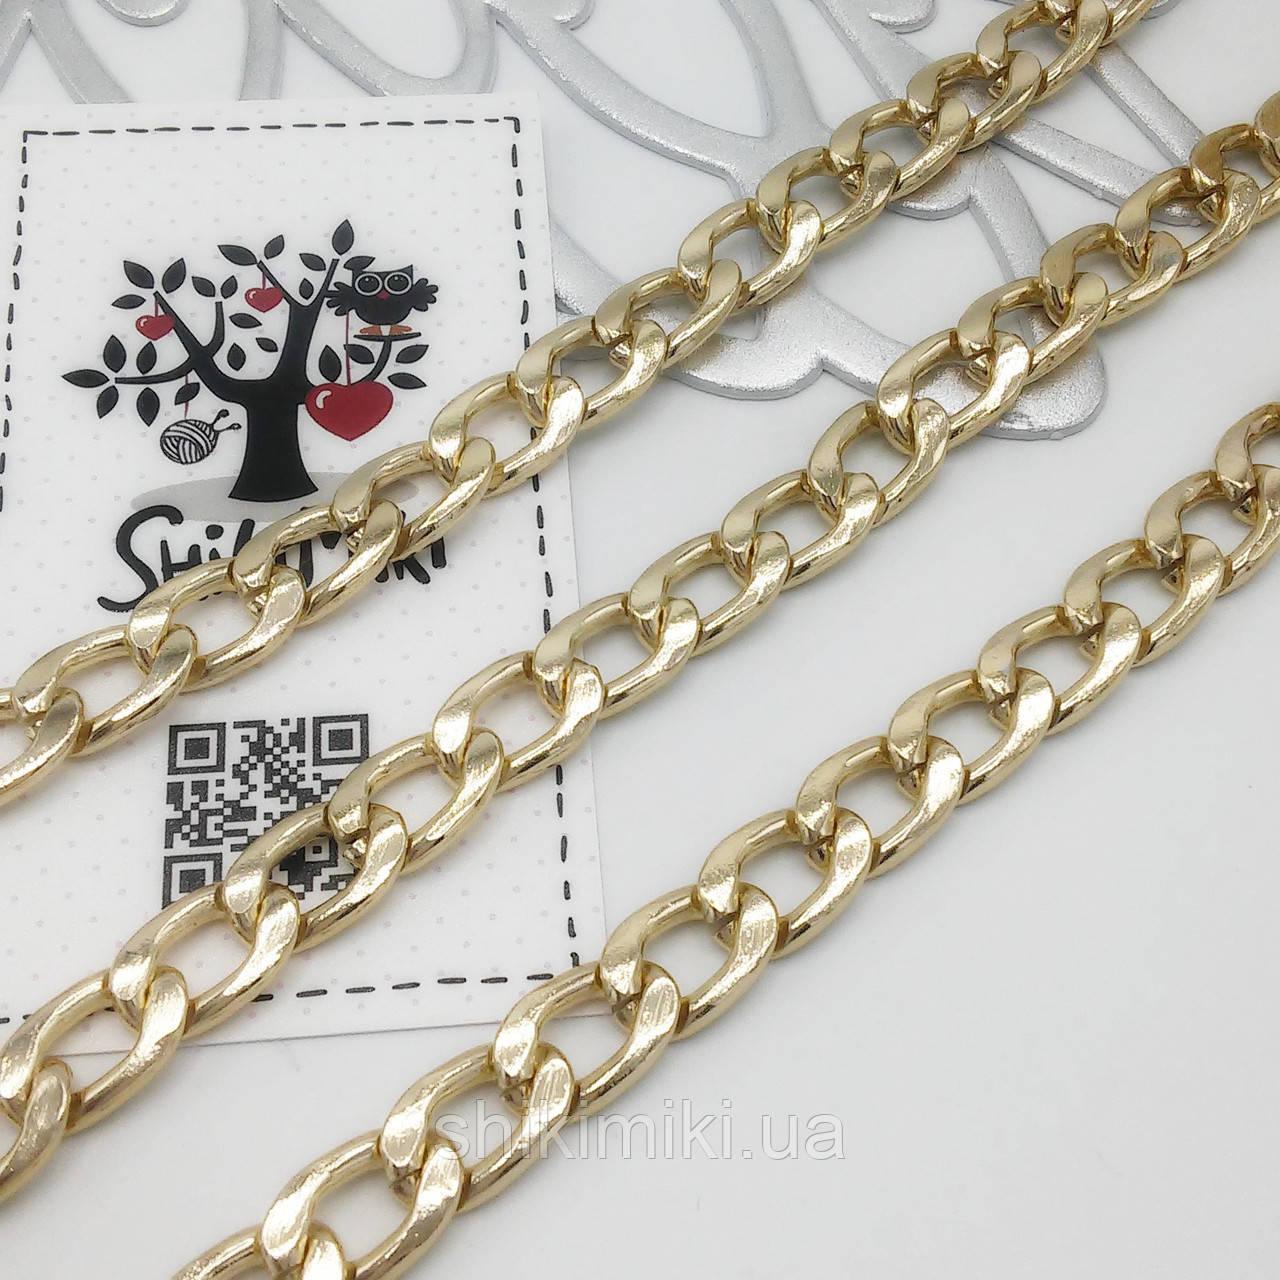 Цепочка для сумки средняя плоская  Z29-3, цвет золото